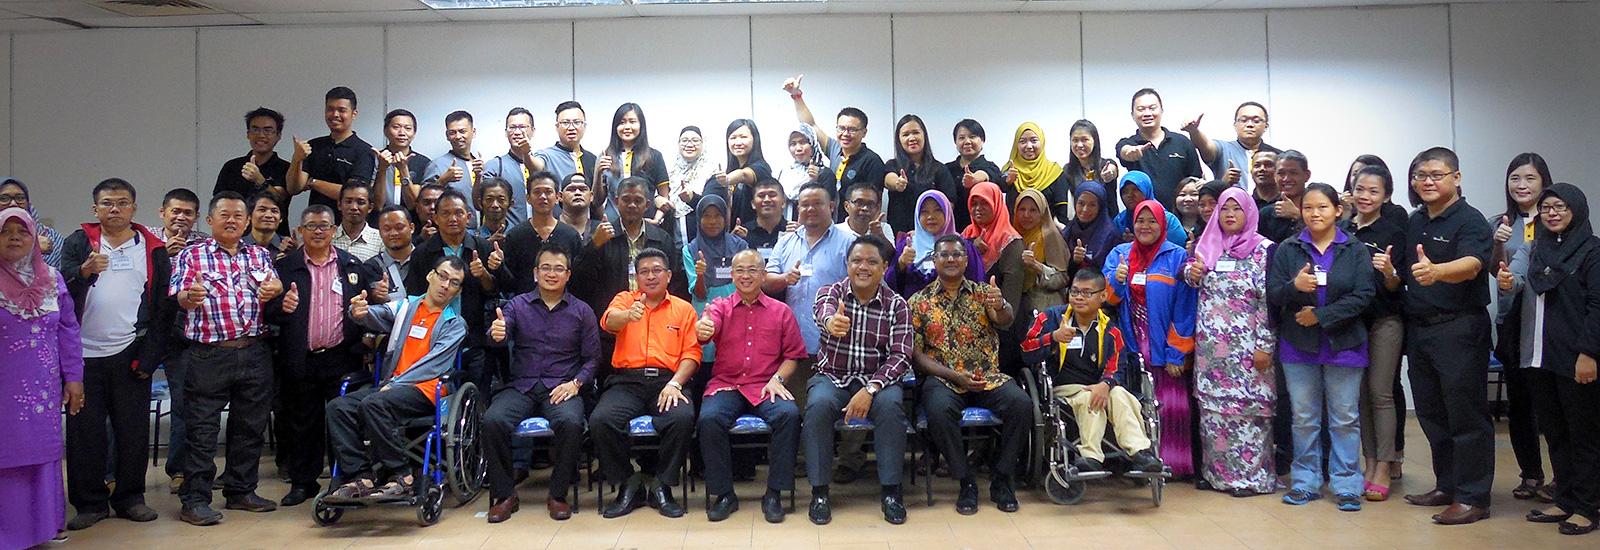 Maybank Foundation expands R.I.S.E Programme to Labuan